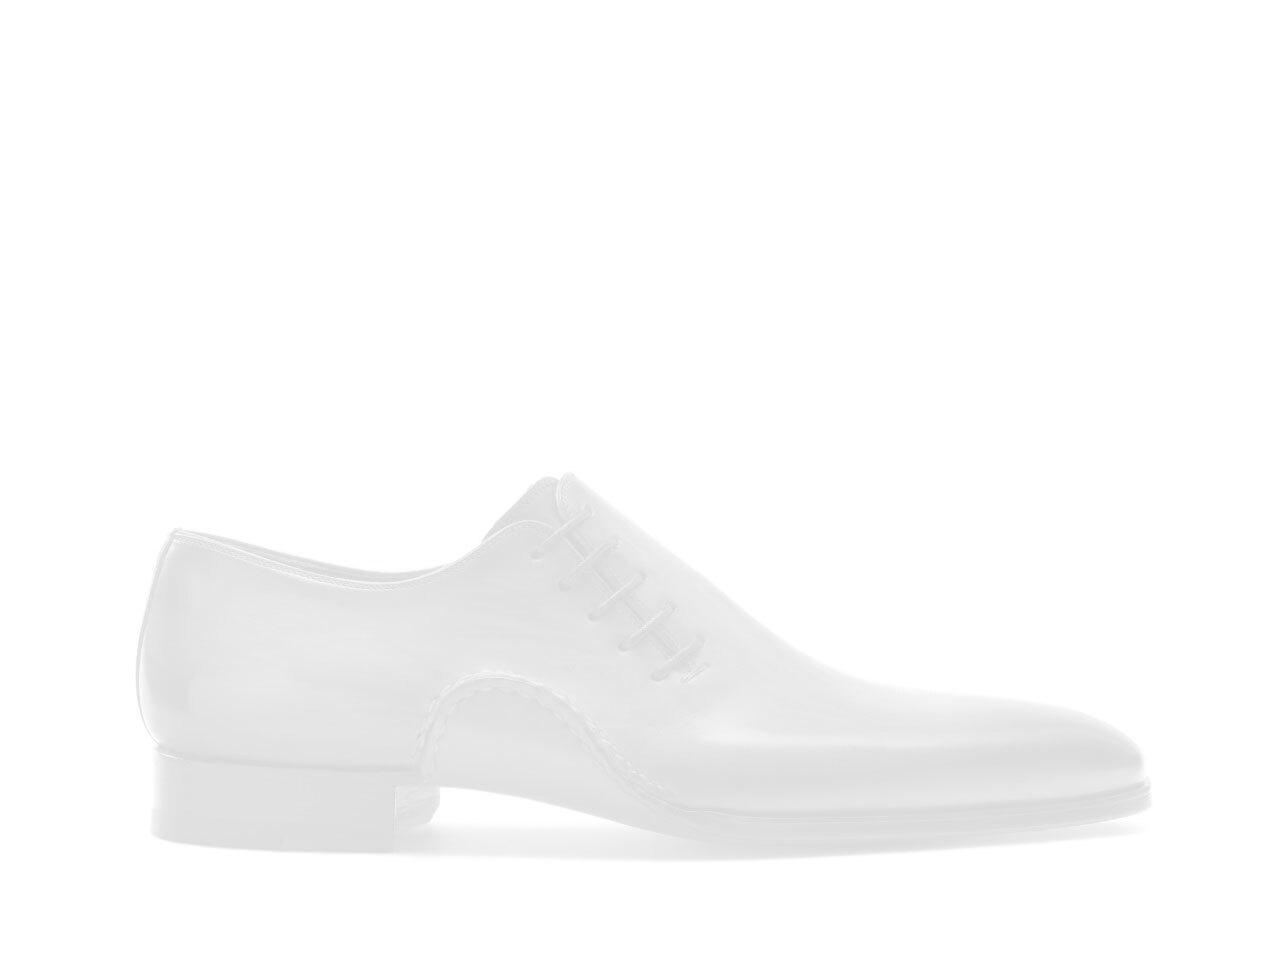 Side view of the Magnanni Marco Cuero Men's Single Monk Strap Shoes